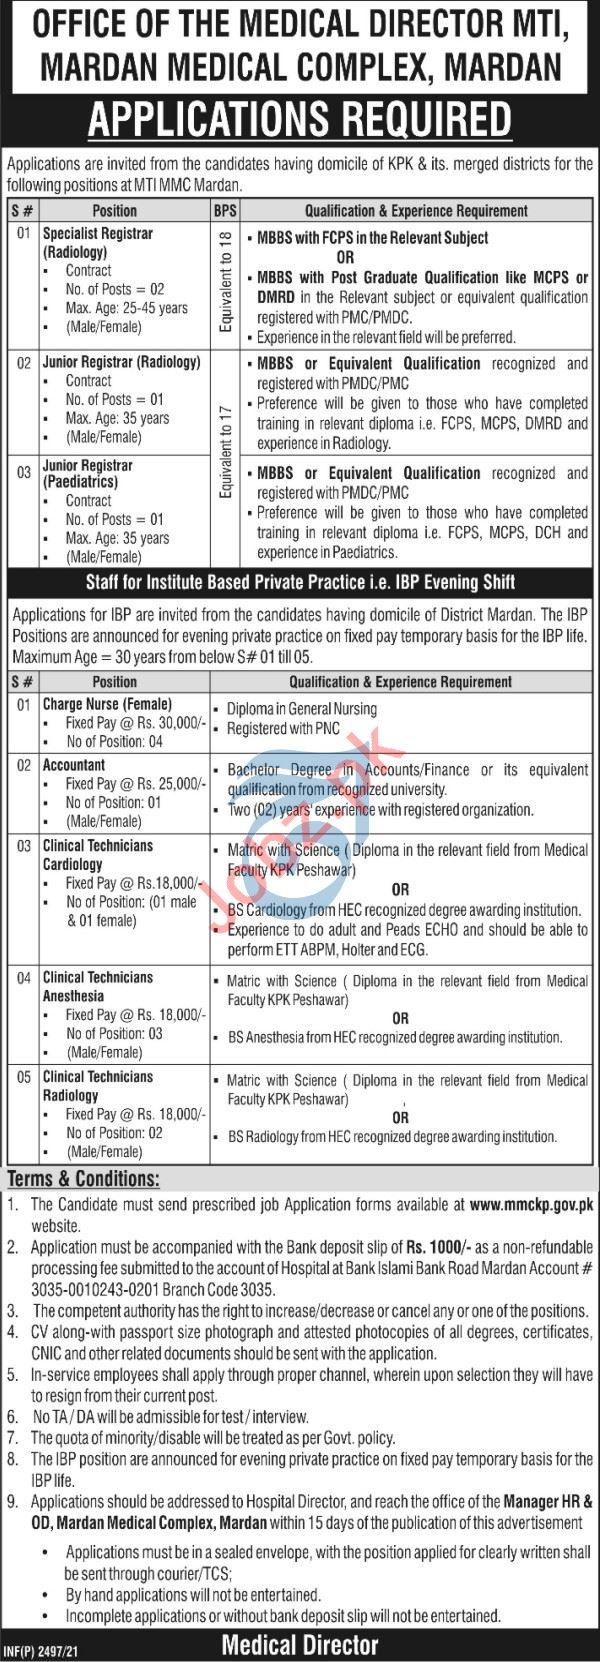 Mardan Medical Complex MMC MTI Jobs 2021 for Registrars